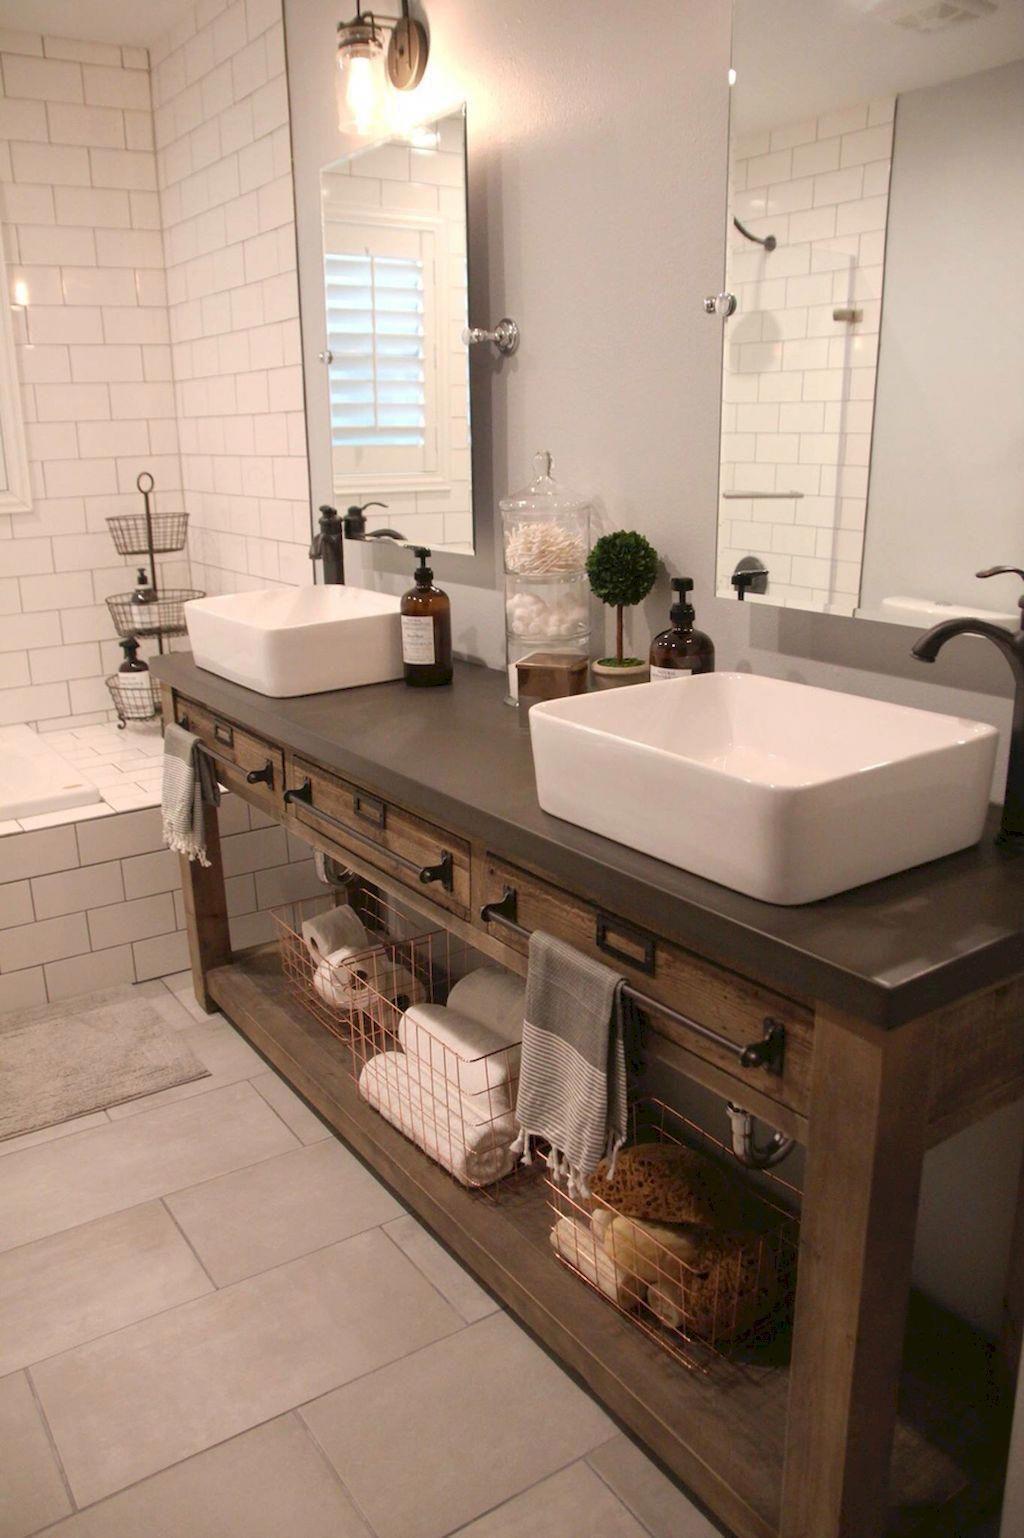 Discover Your Ideal Bathroom Sink Rakovina Chasha Rakovina Vannaya